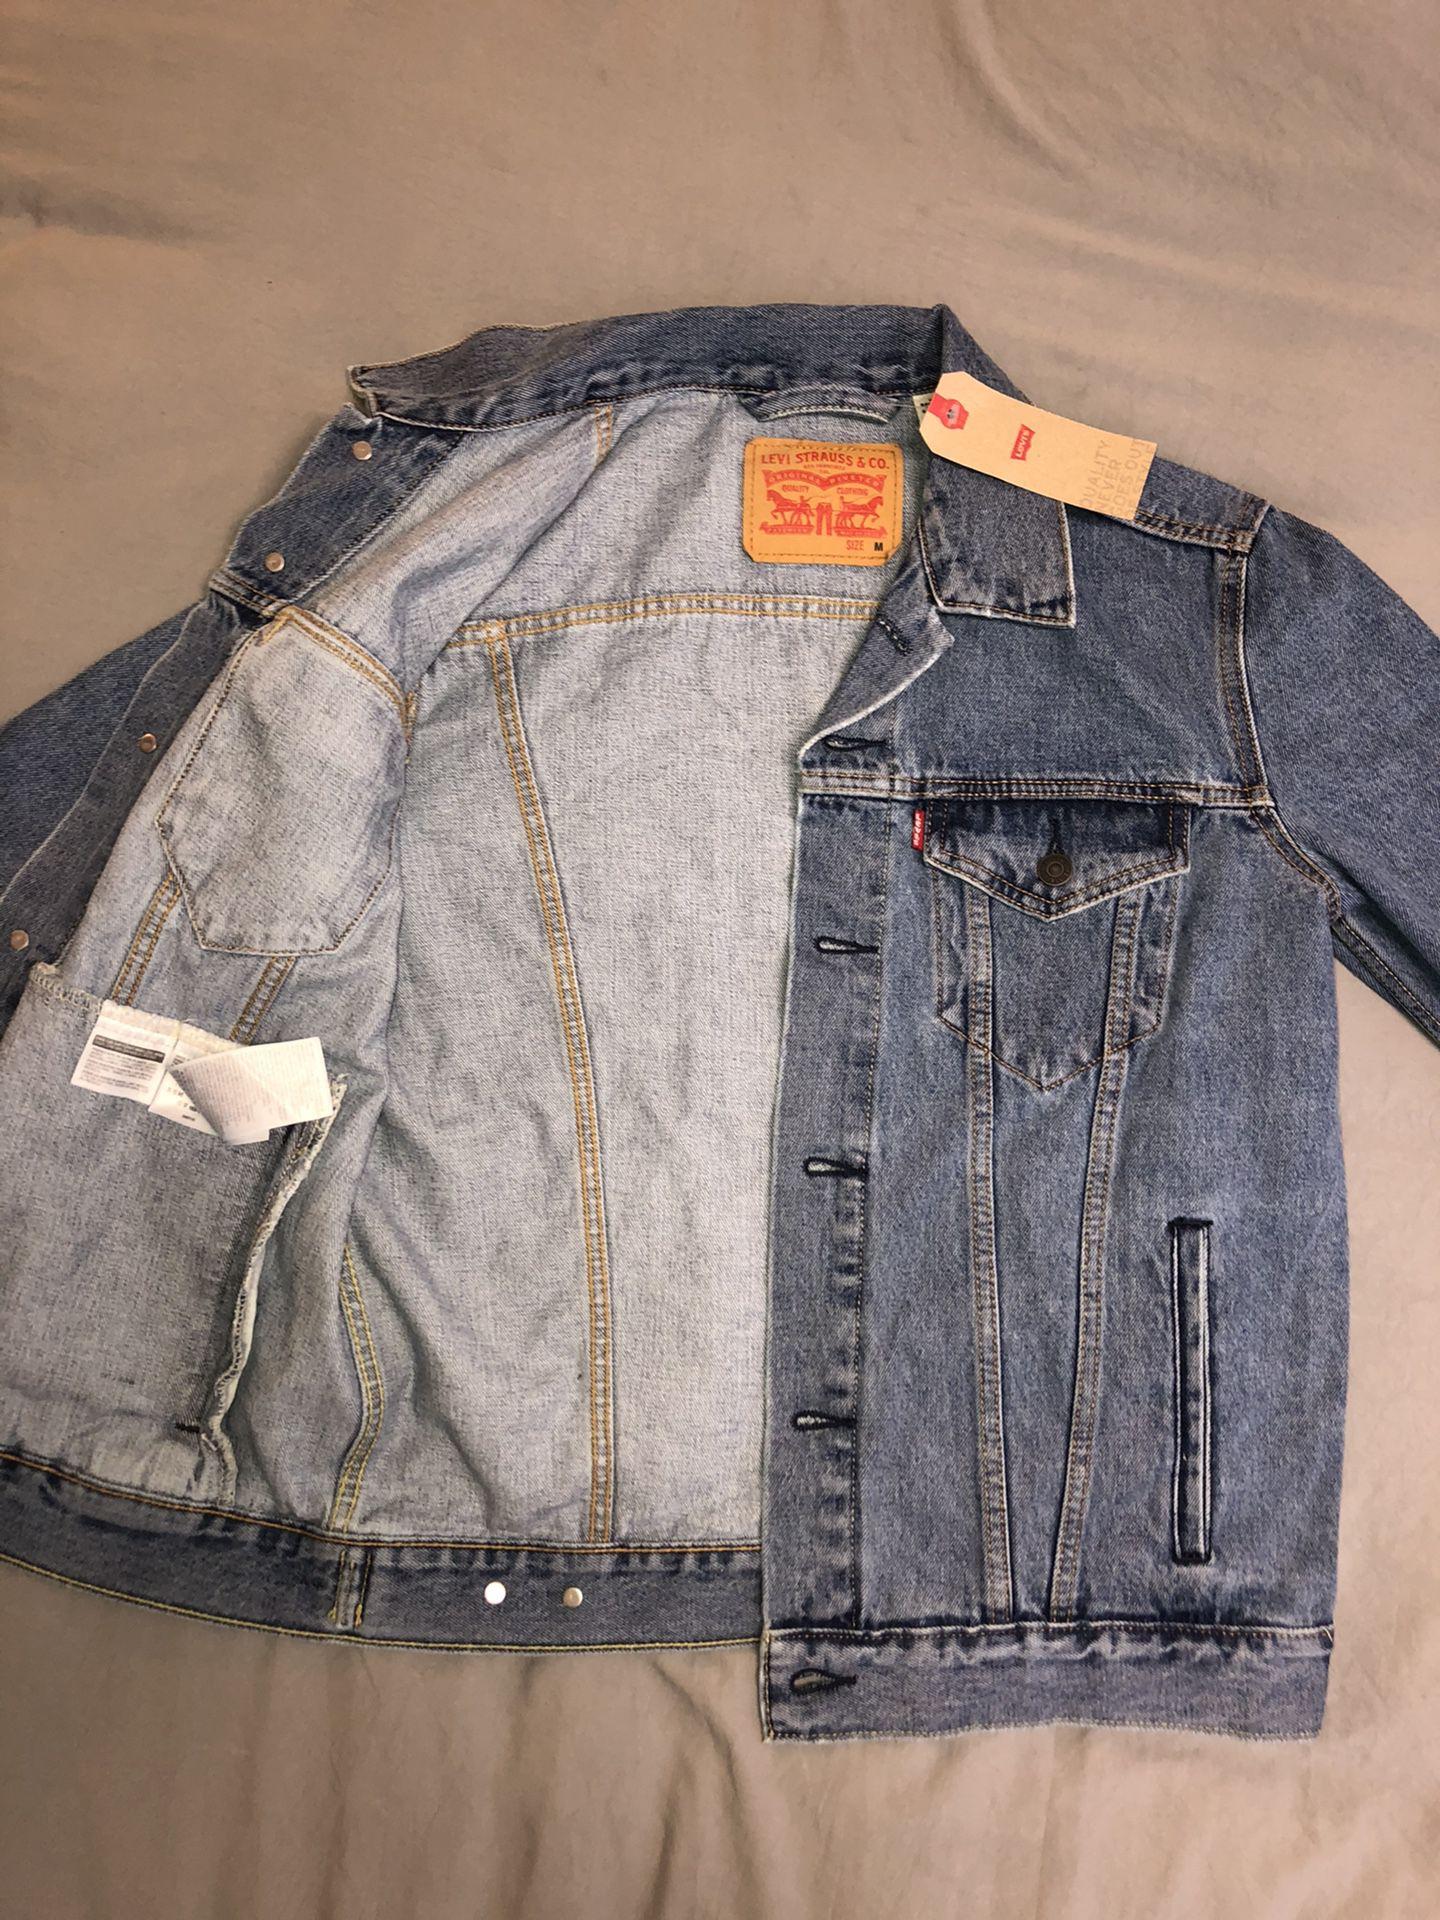 Jean jacket Levi's brand new never worn